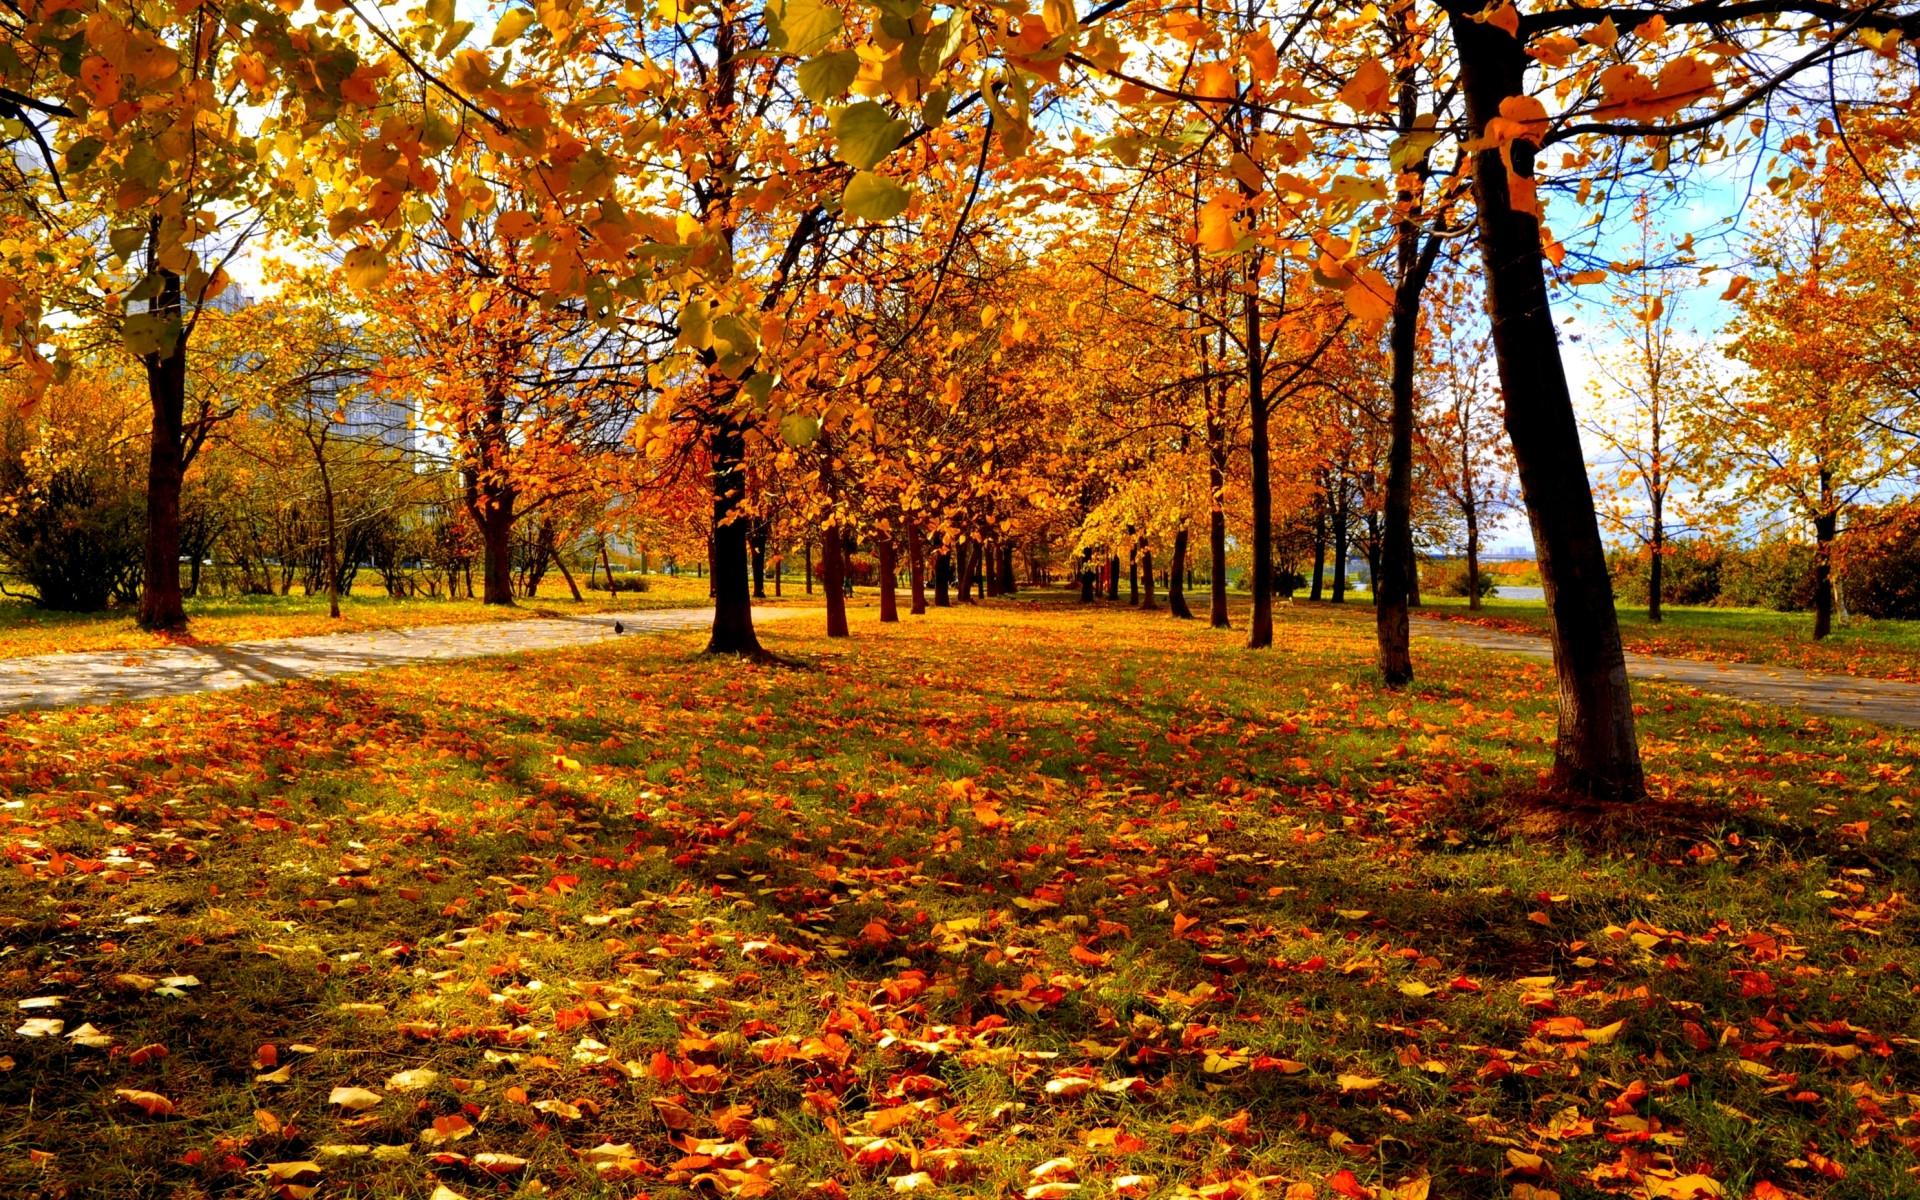 Fall Trees Background wallpaper 1920x1200 29981 1920x1200